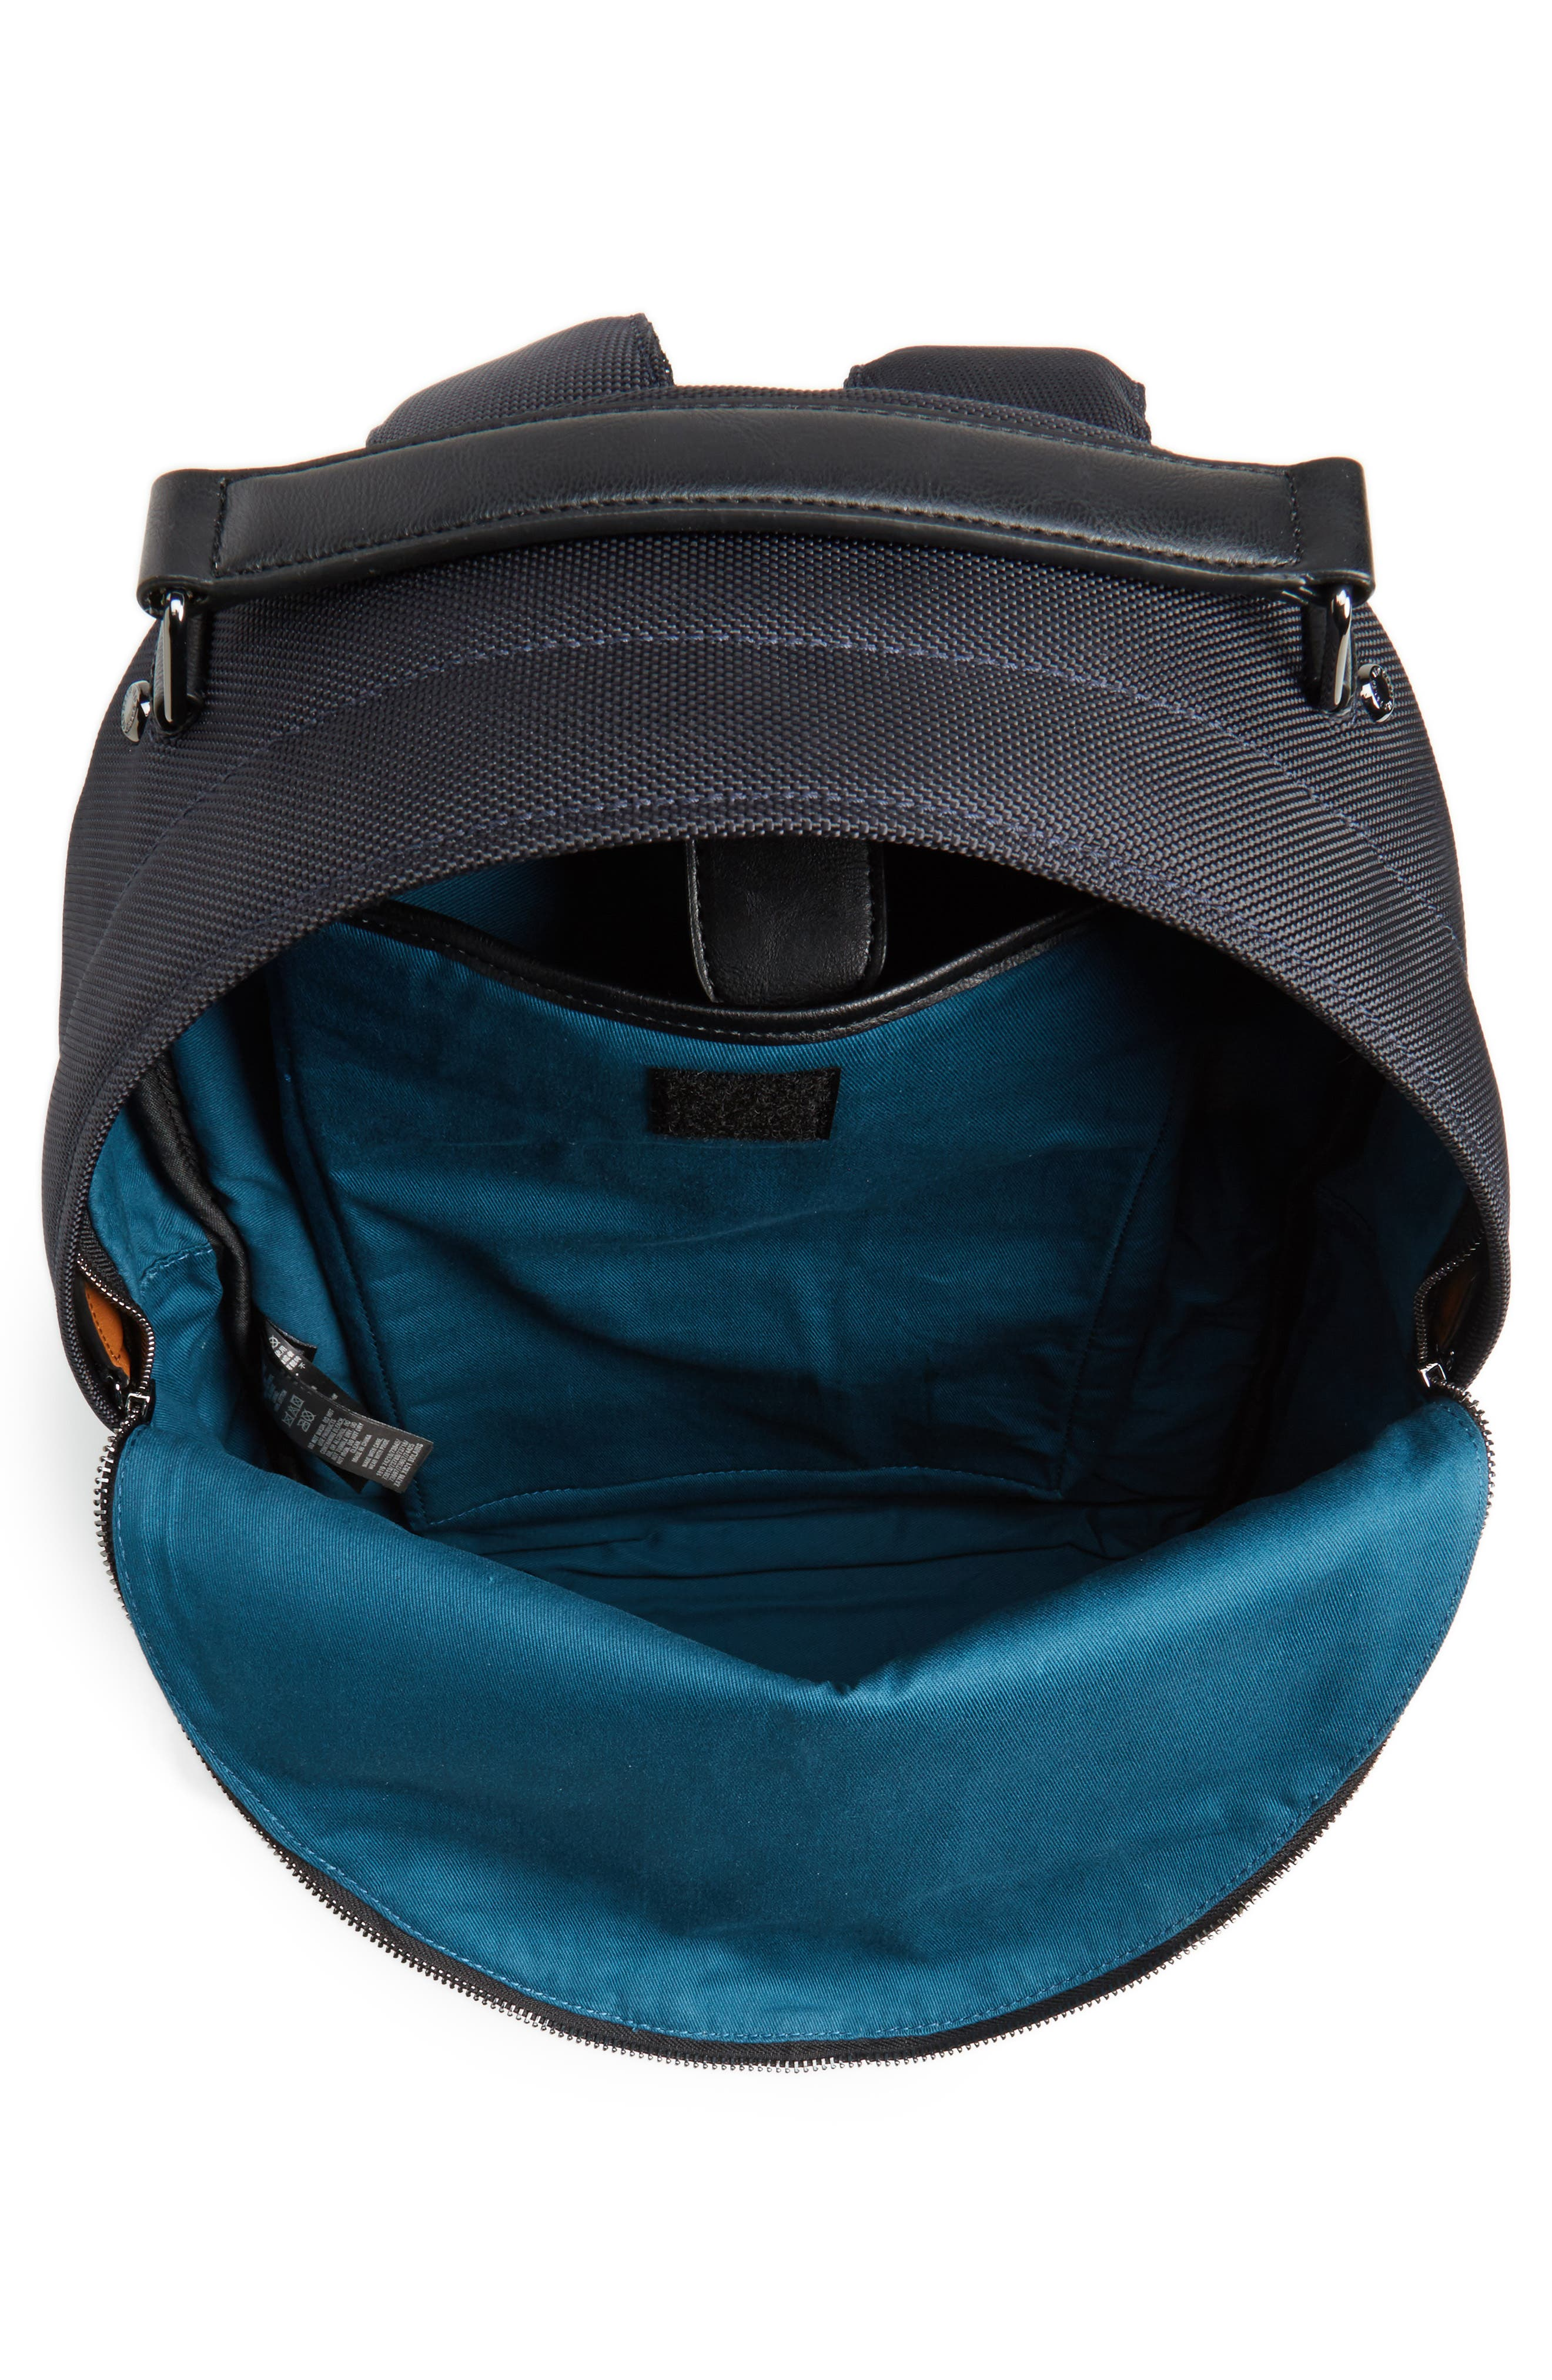 Solaris Backpack,                             Alternate thumbnail 4, color,                             410